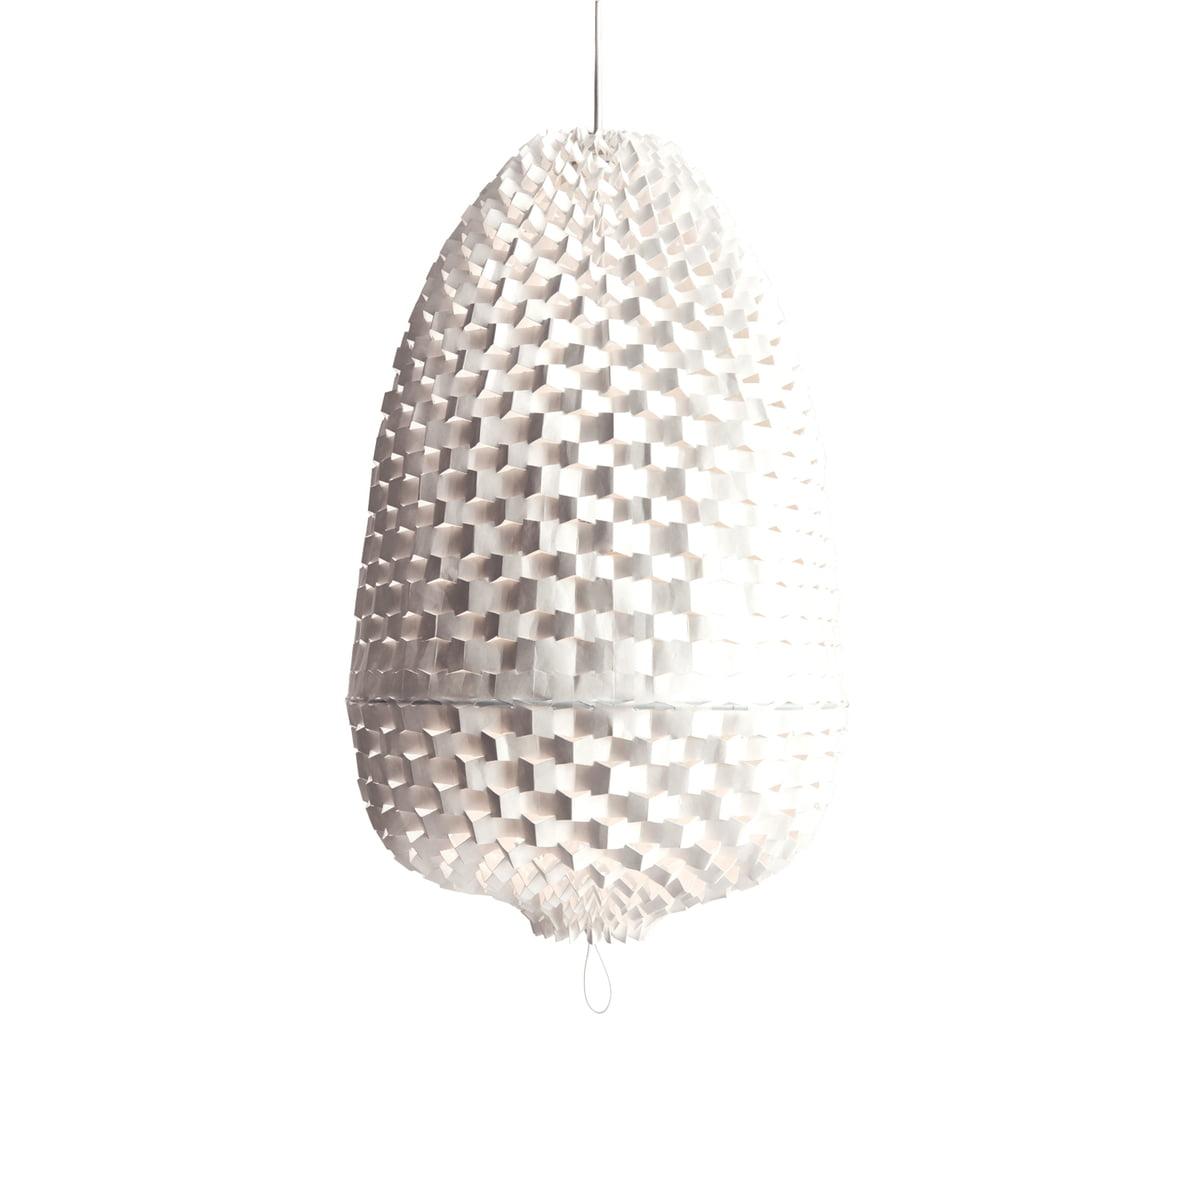 petit trianon pendant lamp by artecnica - artecnica  petit trianons pendant light